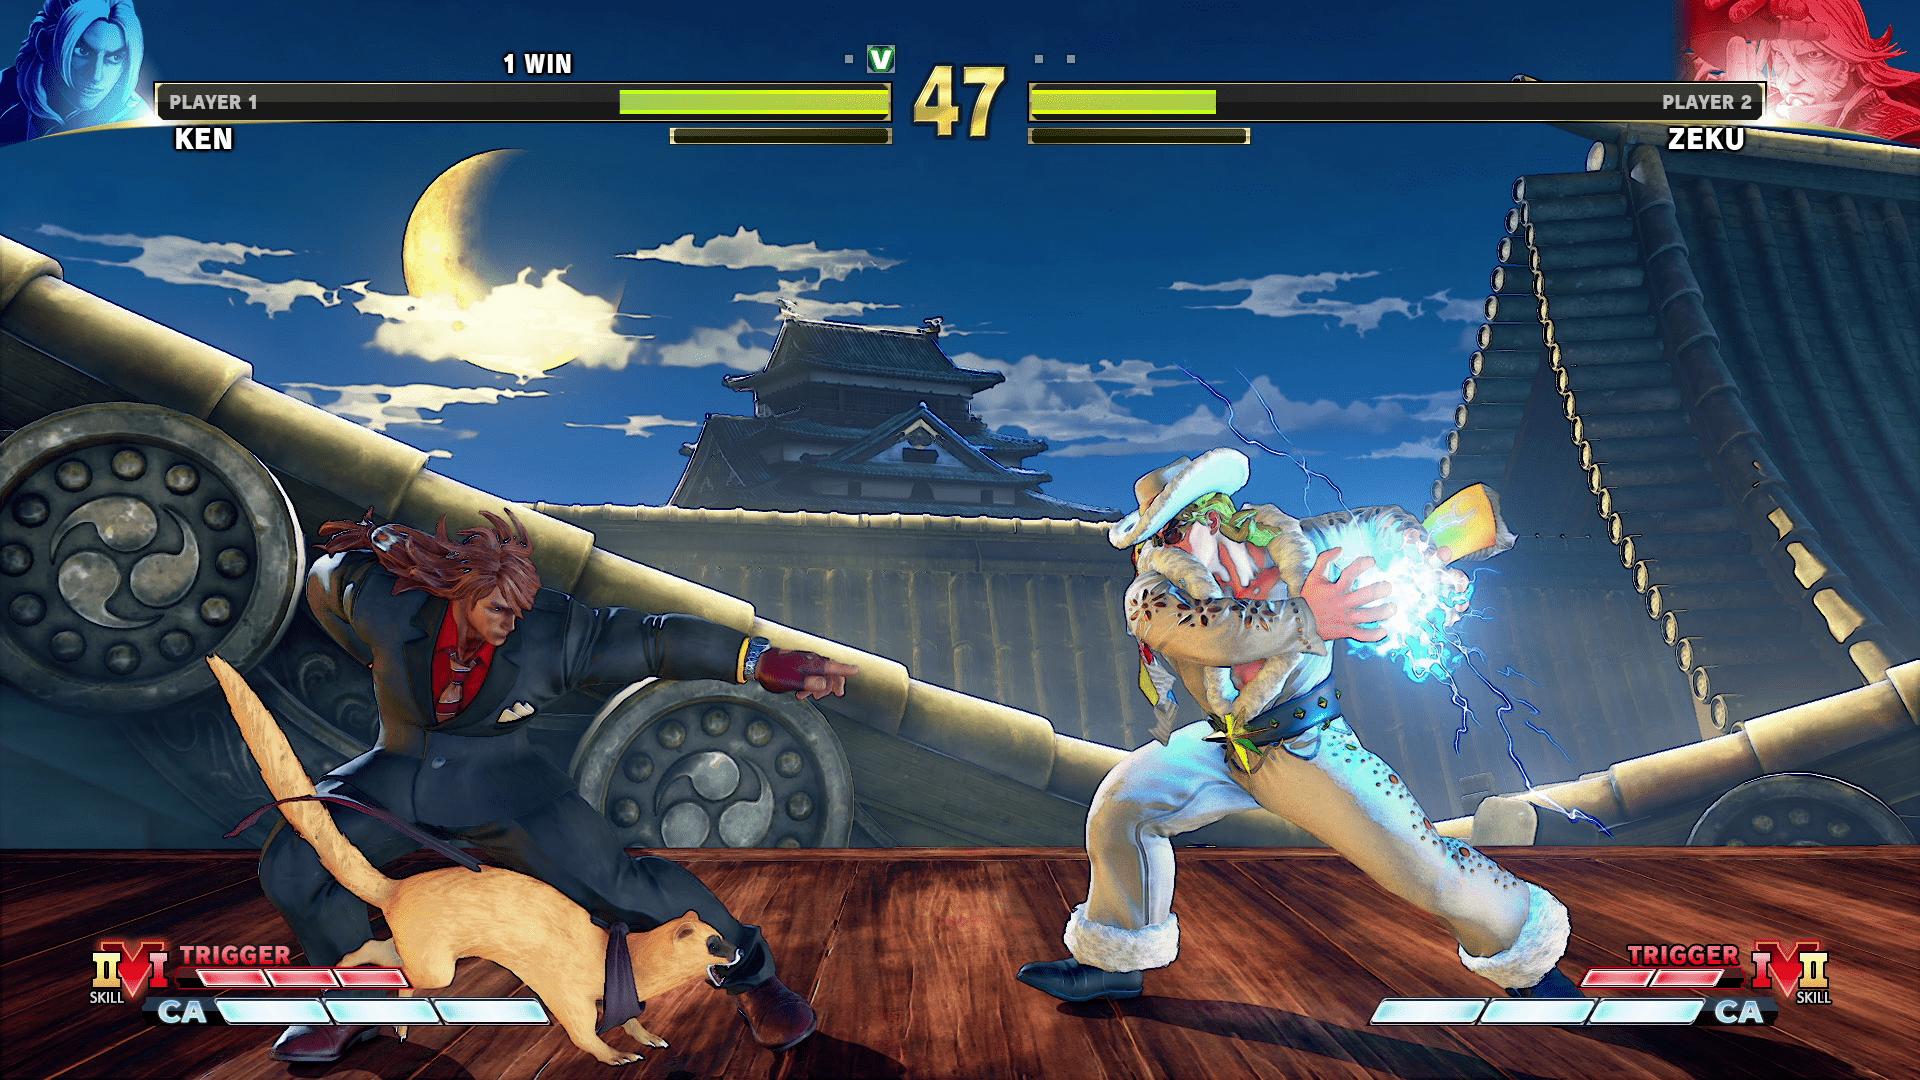 Street Fighter V Champion Edition Playstation 4 Title